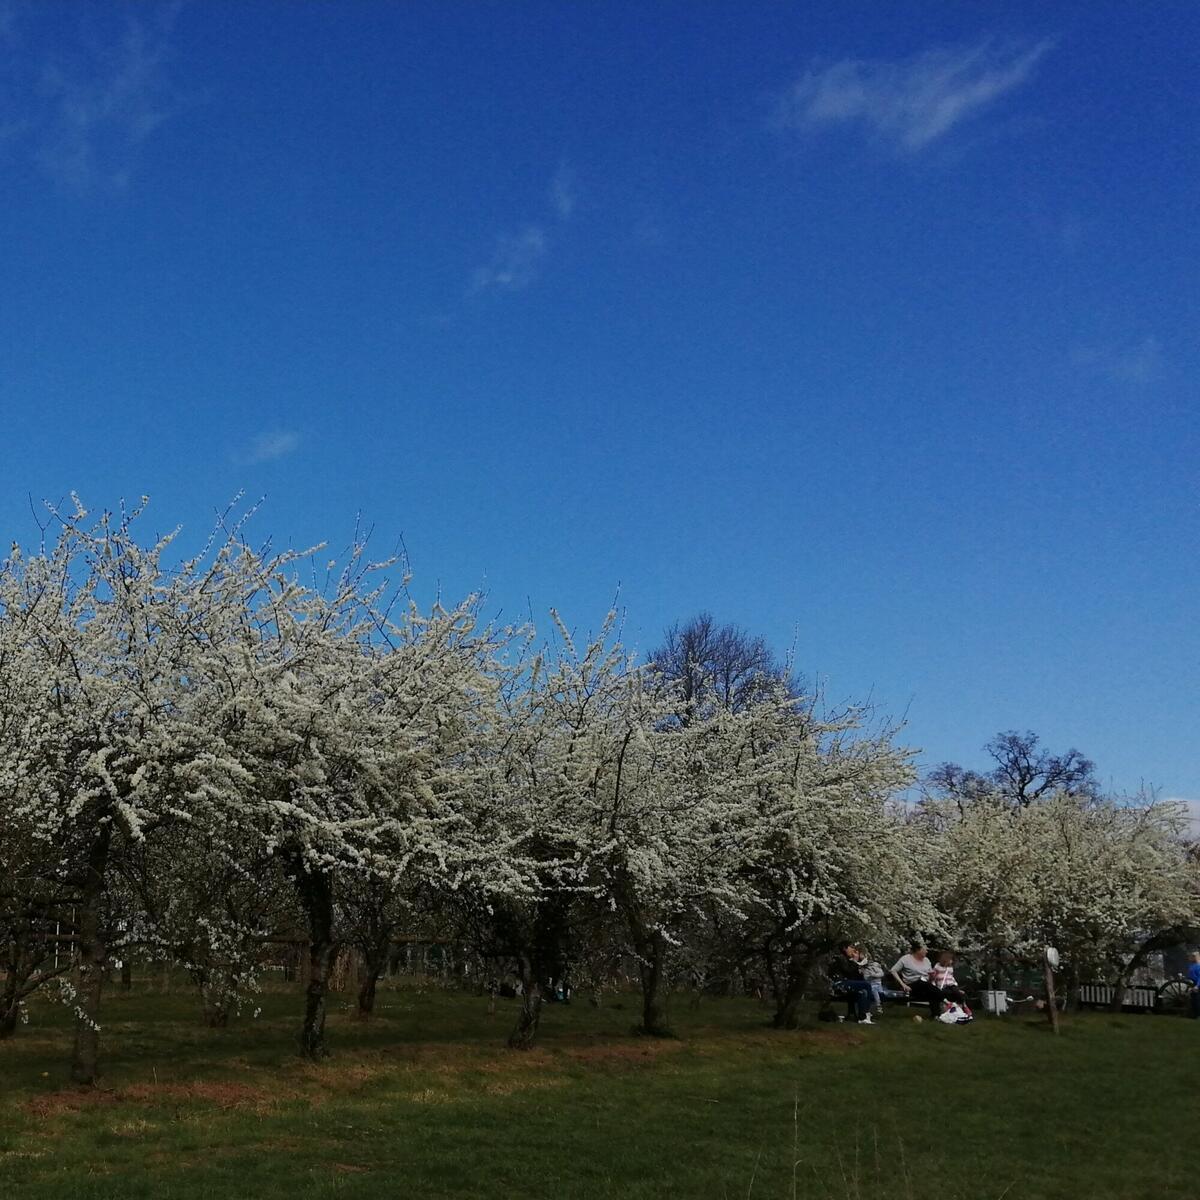 orchard picnic 2/4/2021